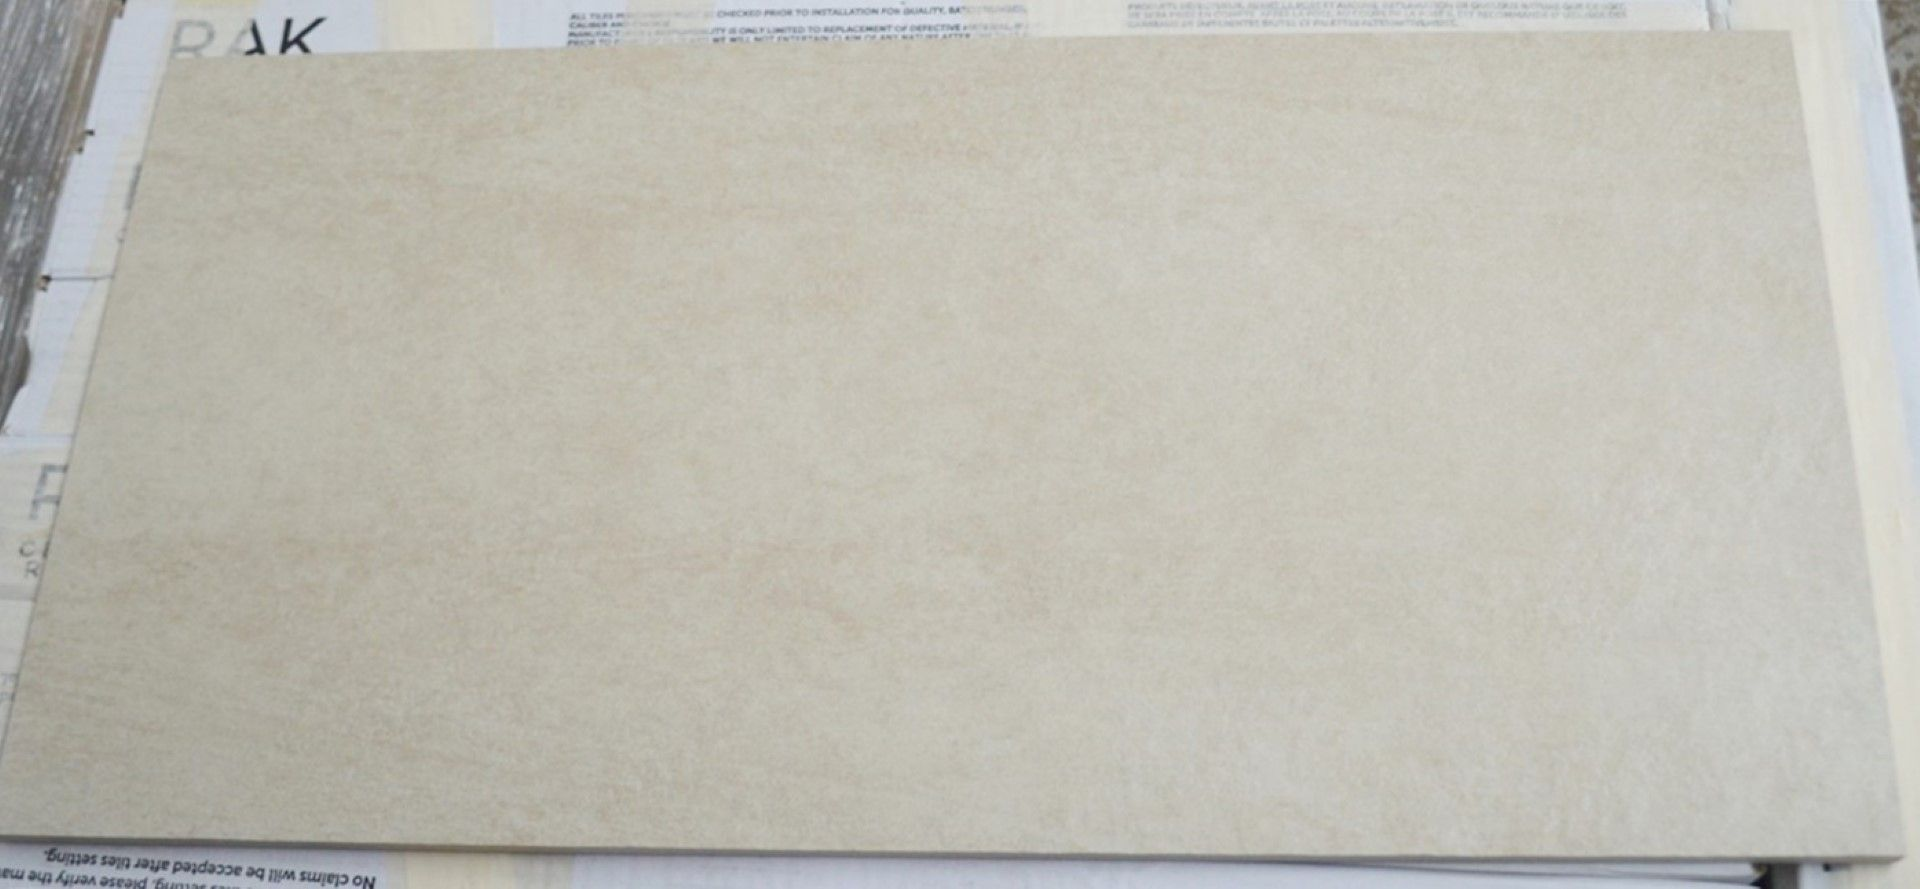 Lot 2556 - 6 x Boxes of RAK Porcelain Floor or Wall Tiles - Concrete Sand Design Design in Beige - 30 x 60 cm